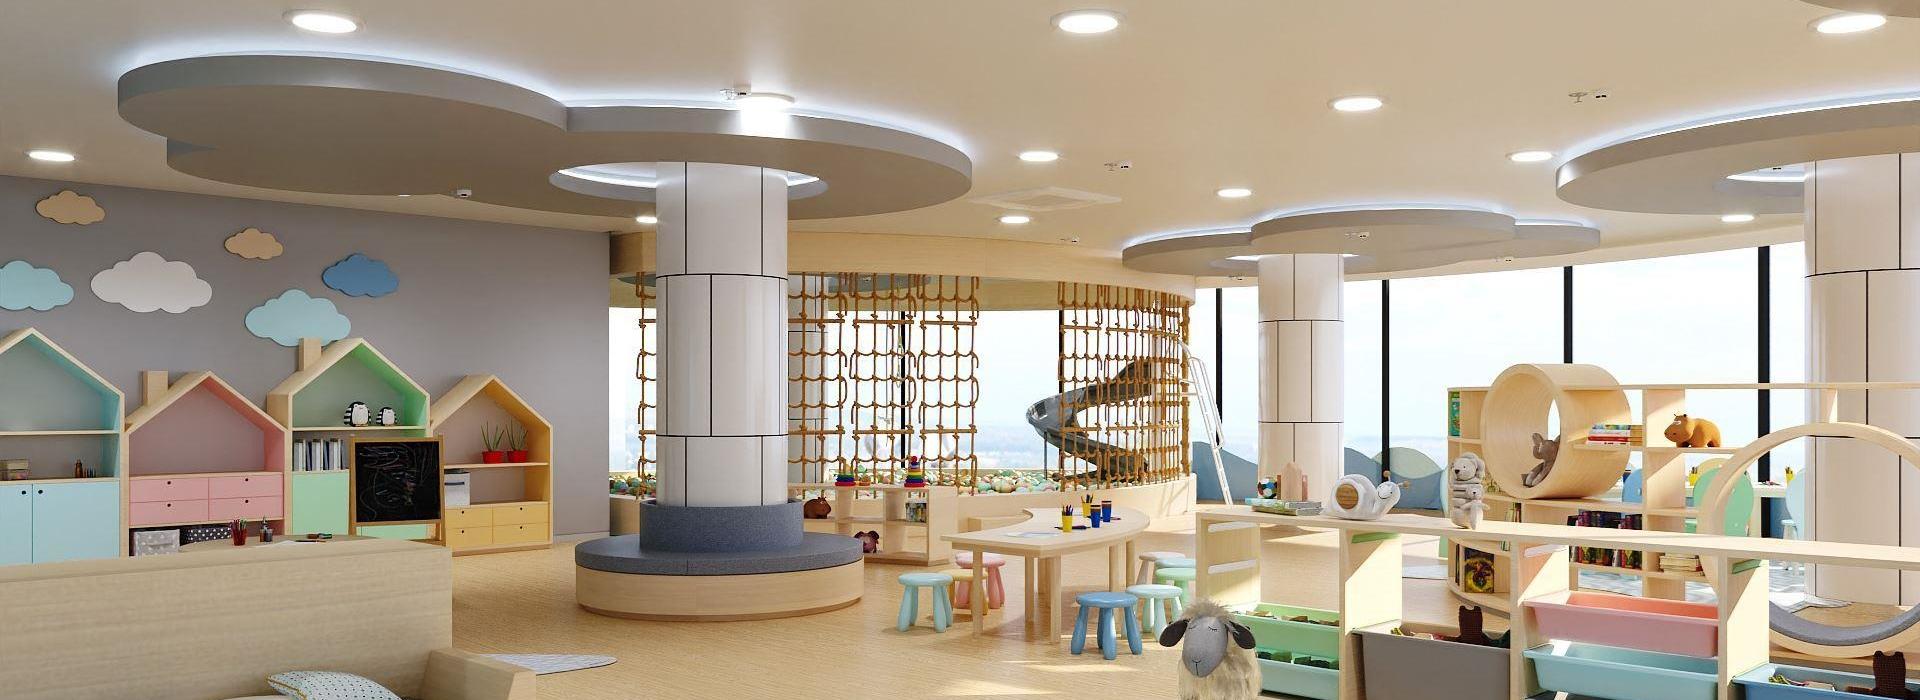 Selectum Noa Resort Cam Ranh 5*